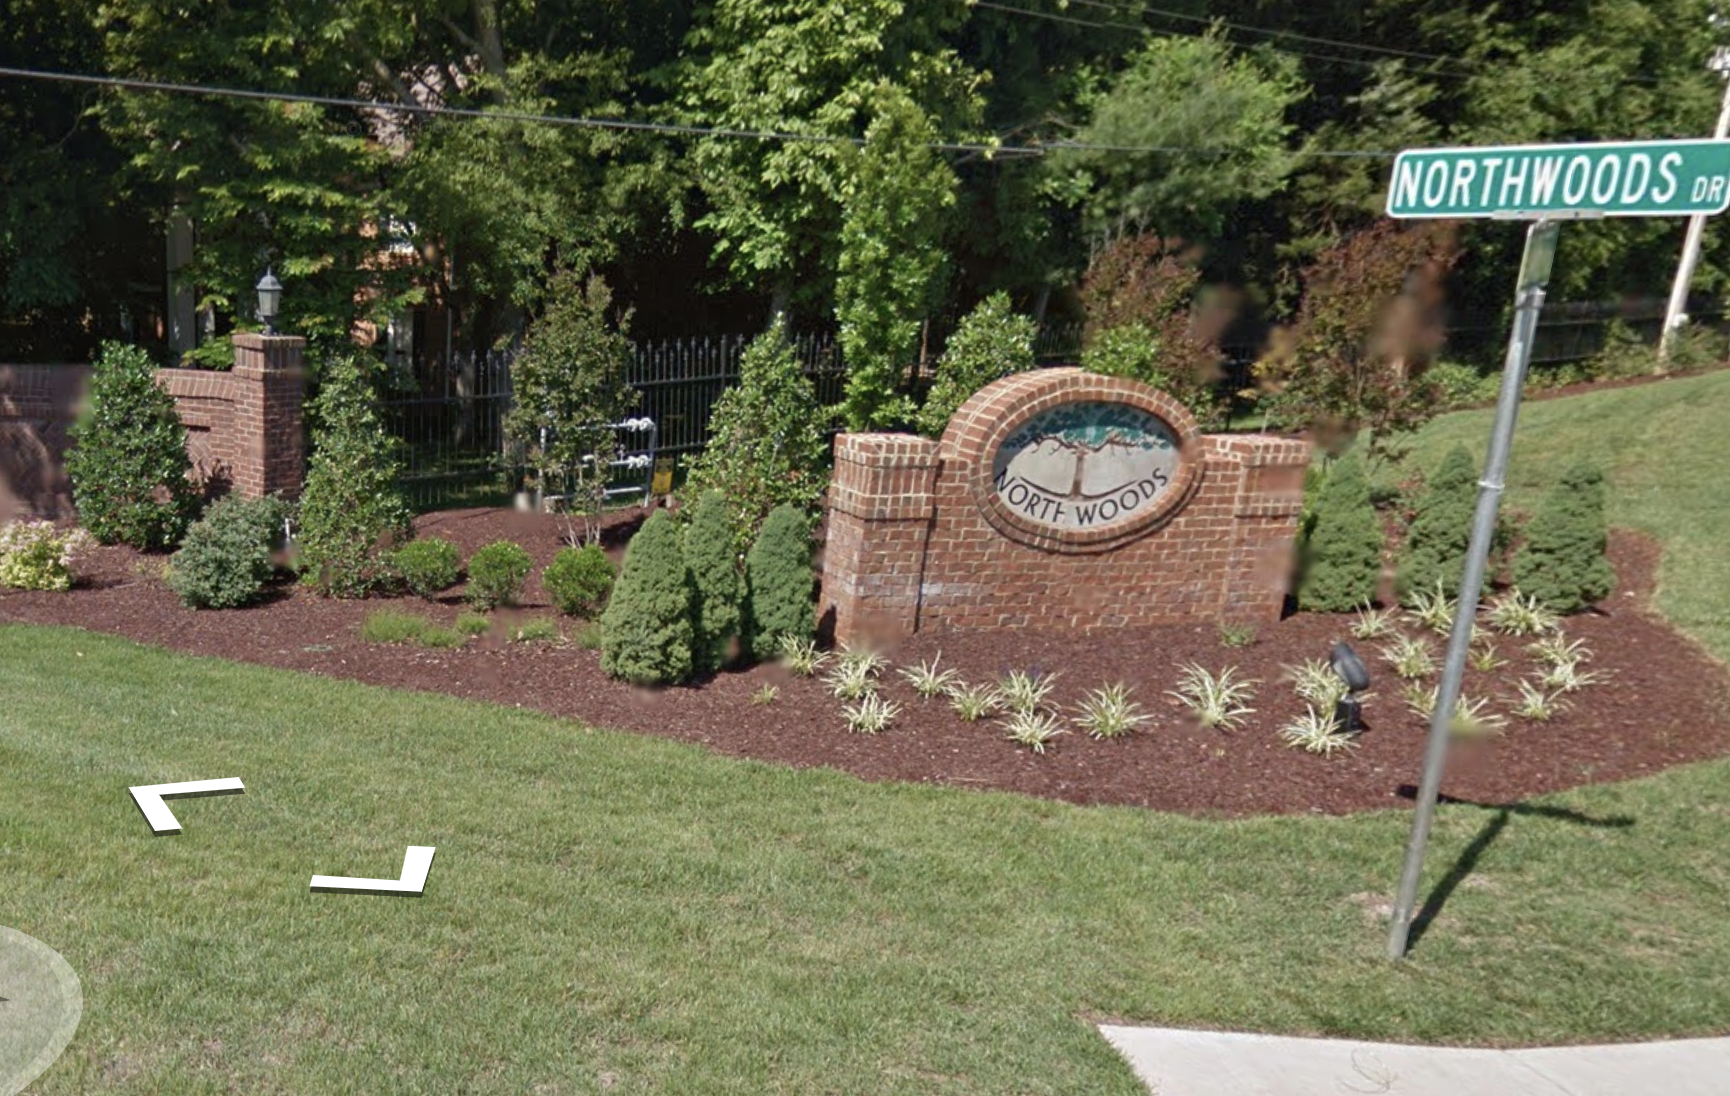 Murfreesboro Neighborhood: Northwoods community image